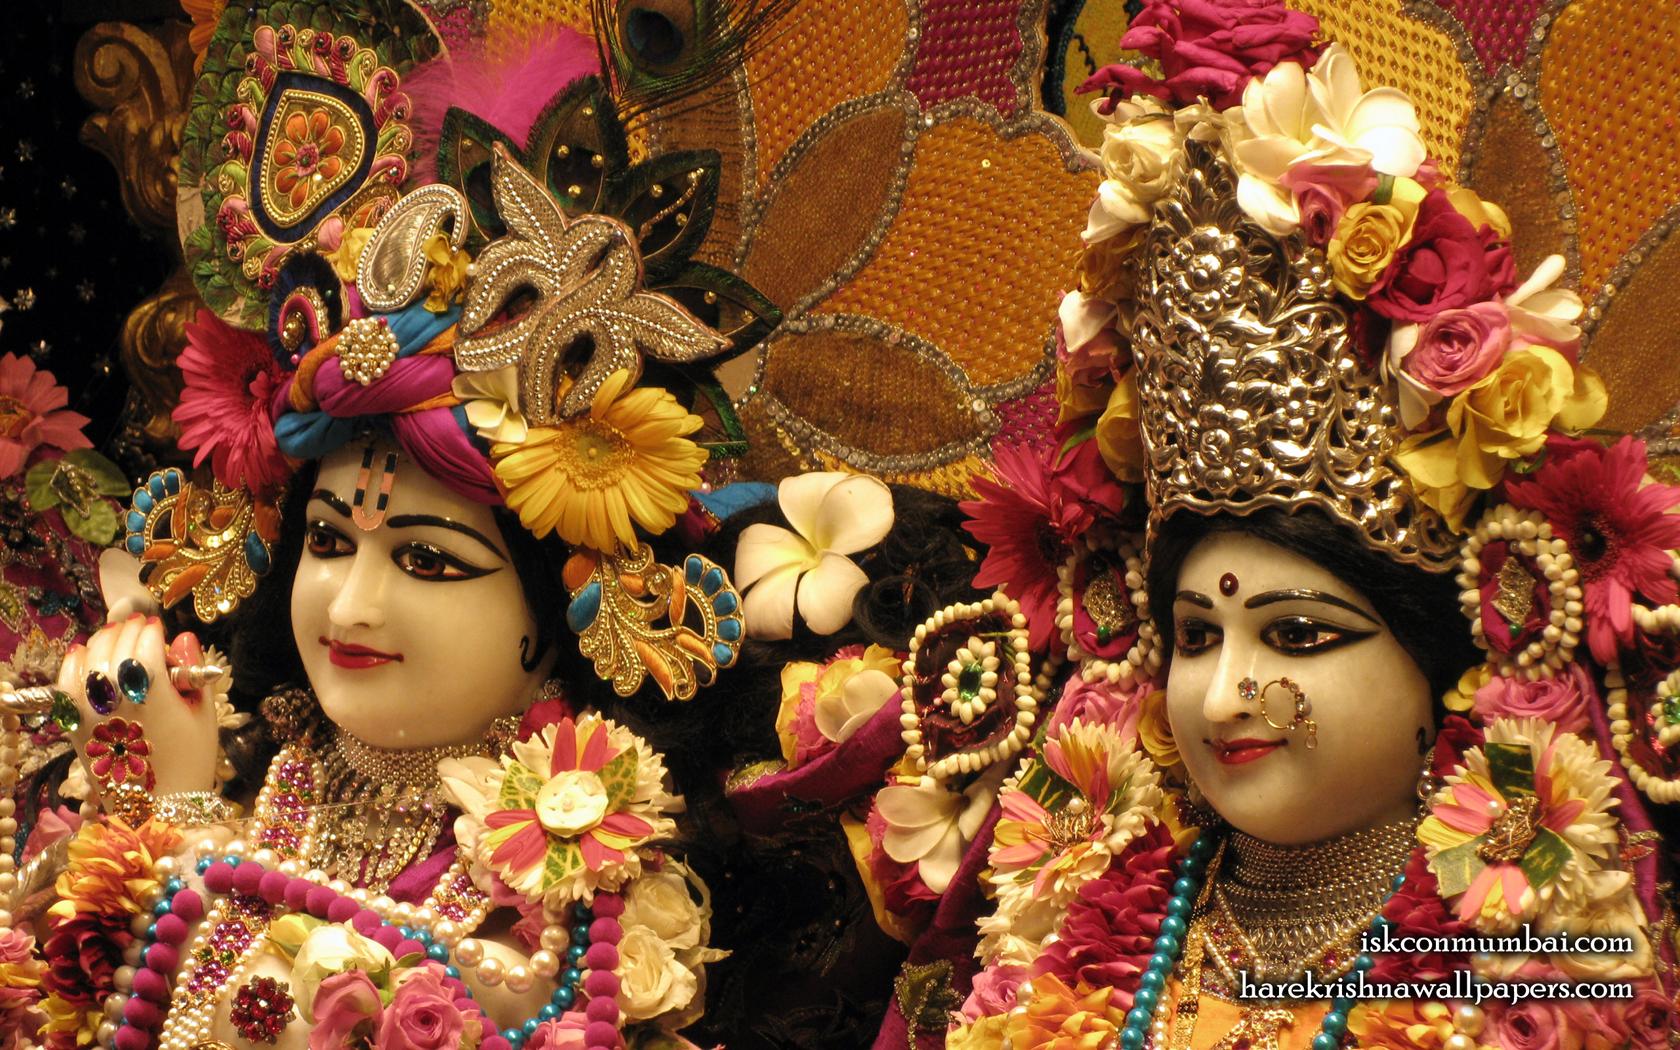 Sri Sri Radha Rasabihari Close up Wallpaper (011) Size 1680x1050 Download